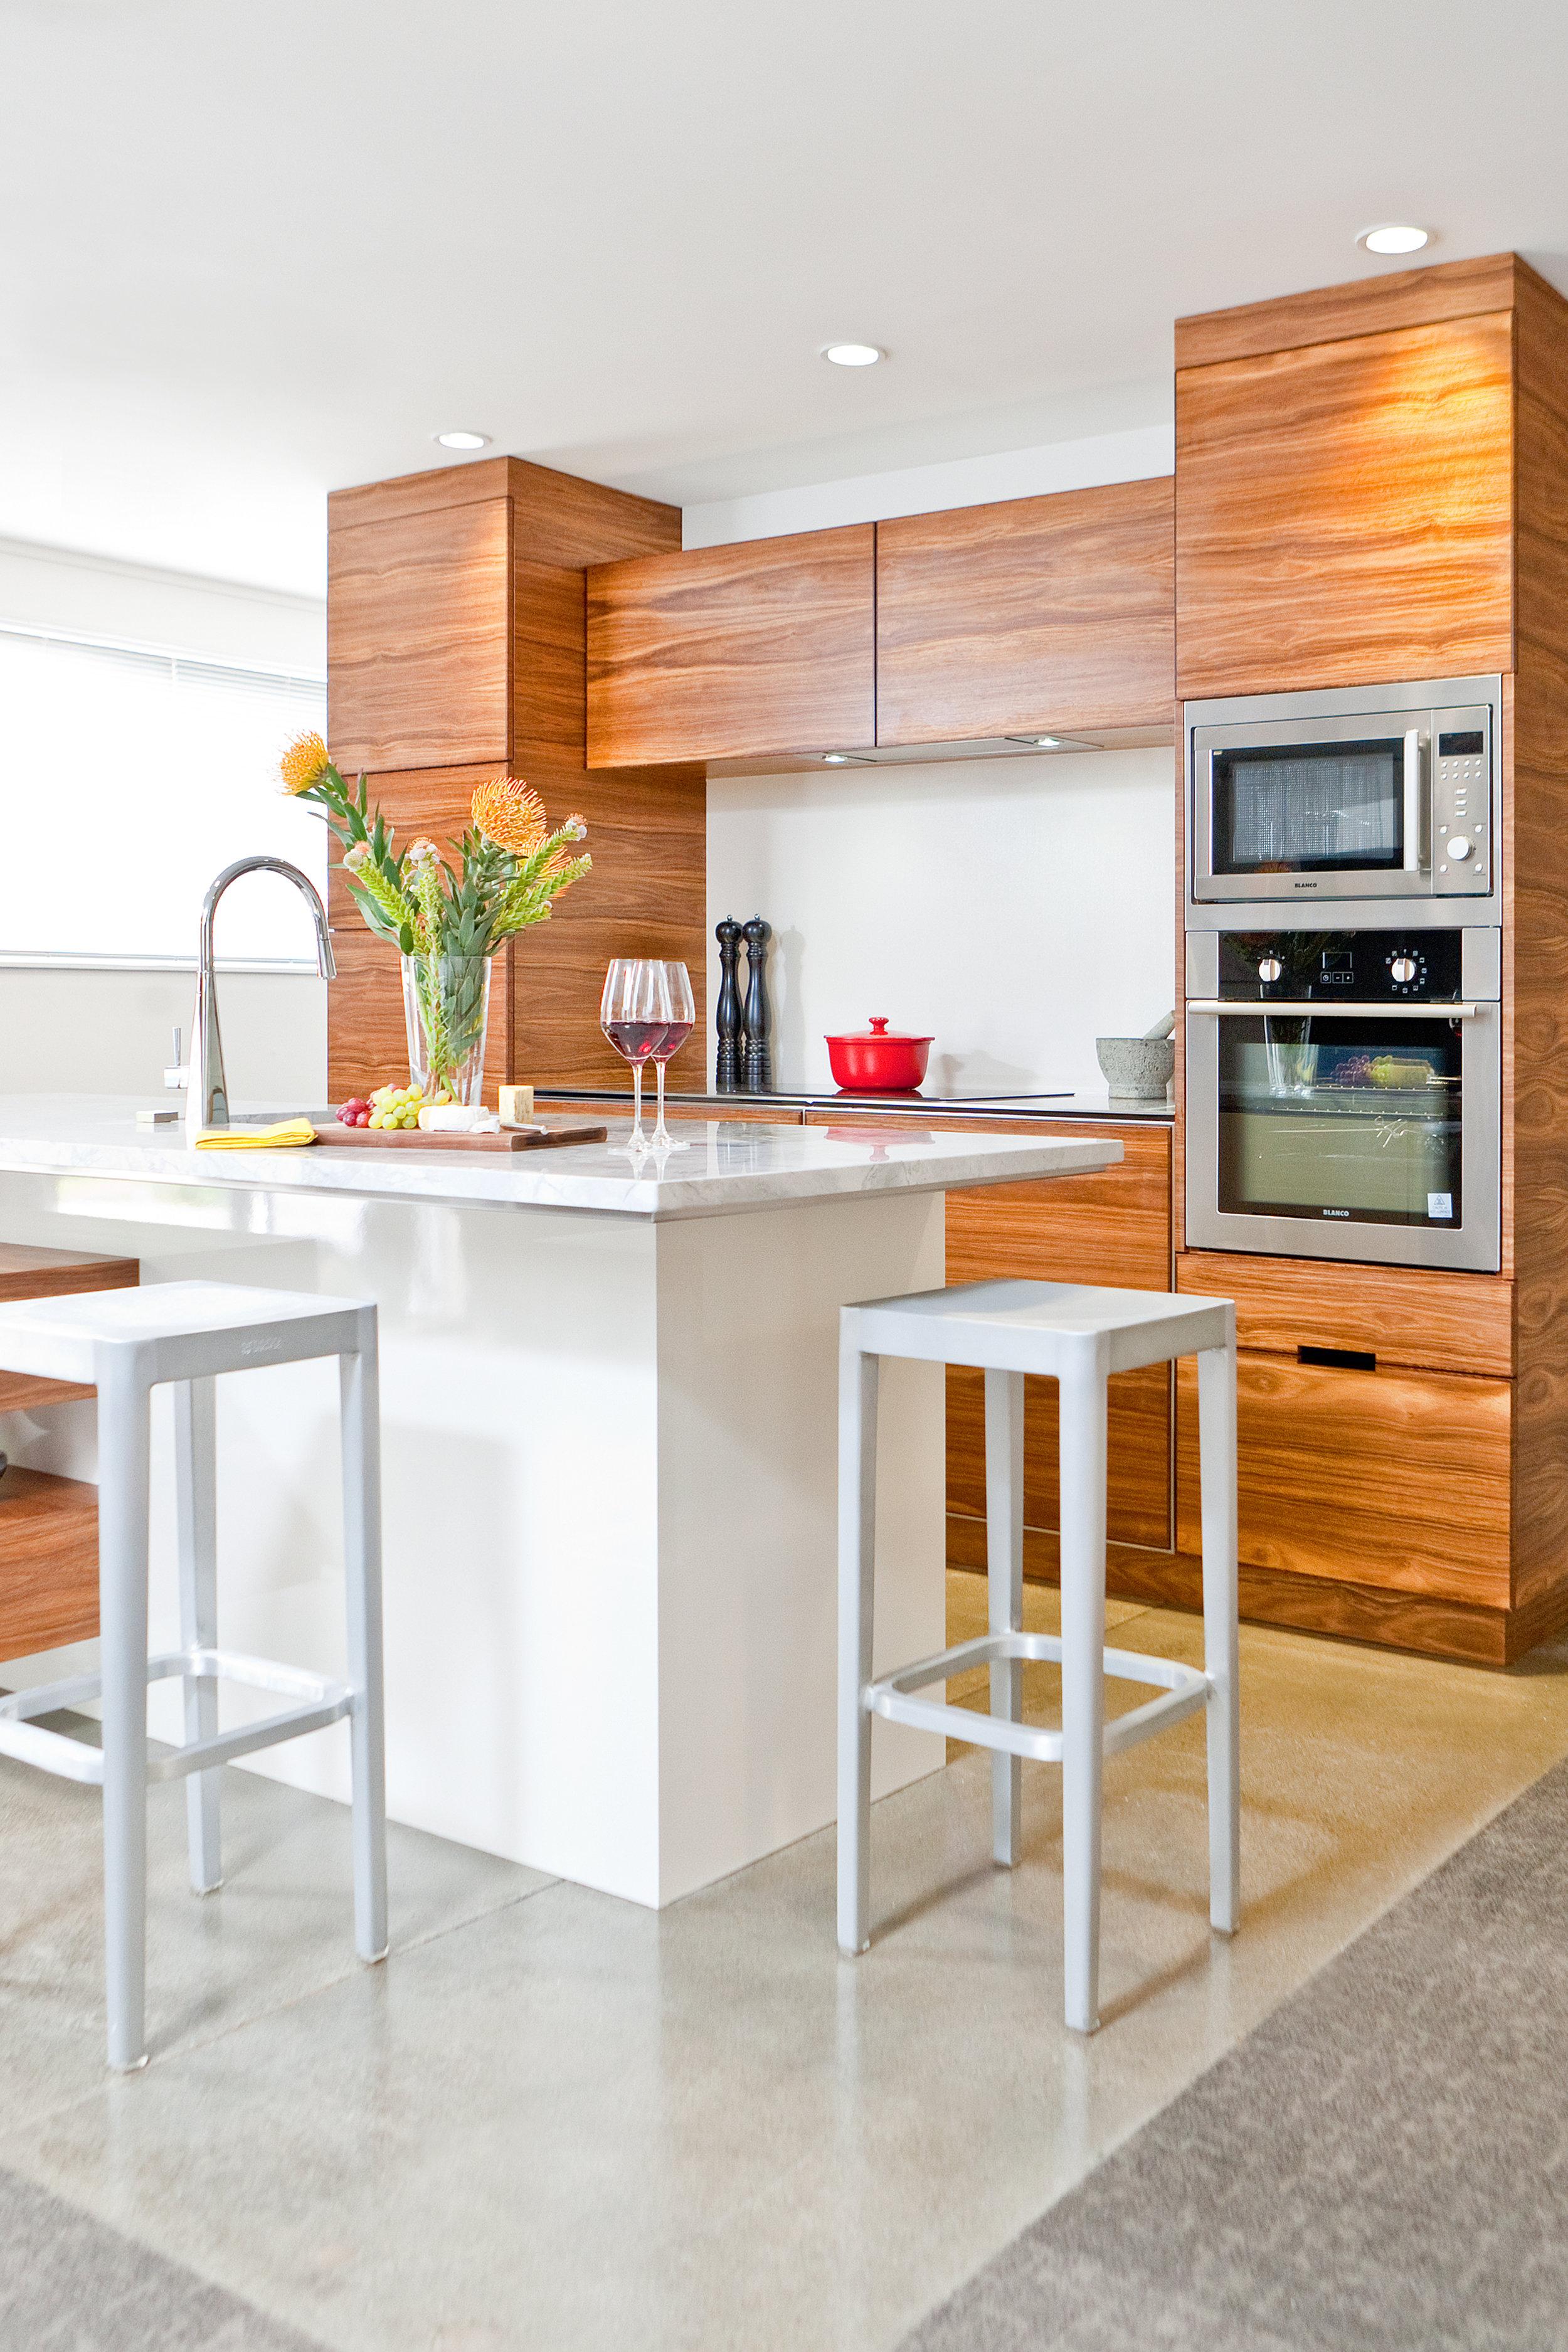 In Haus Design Imagery 100.jpg